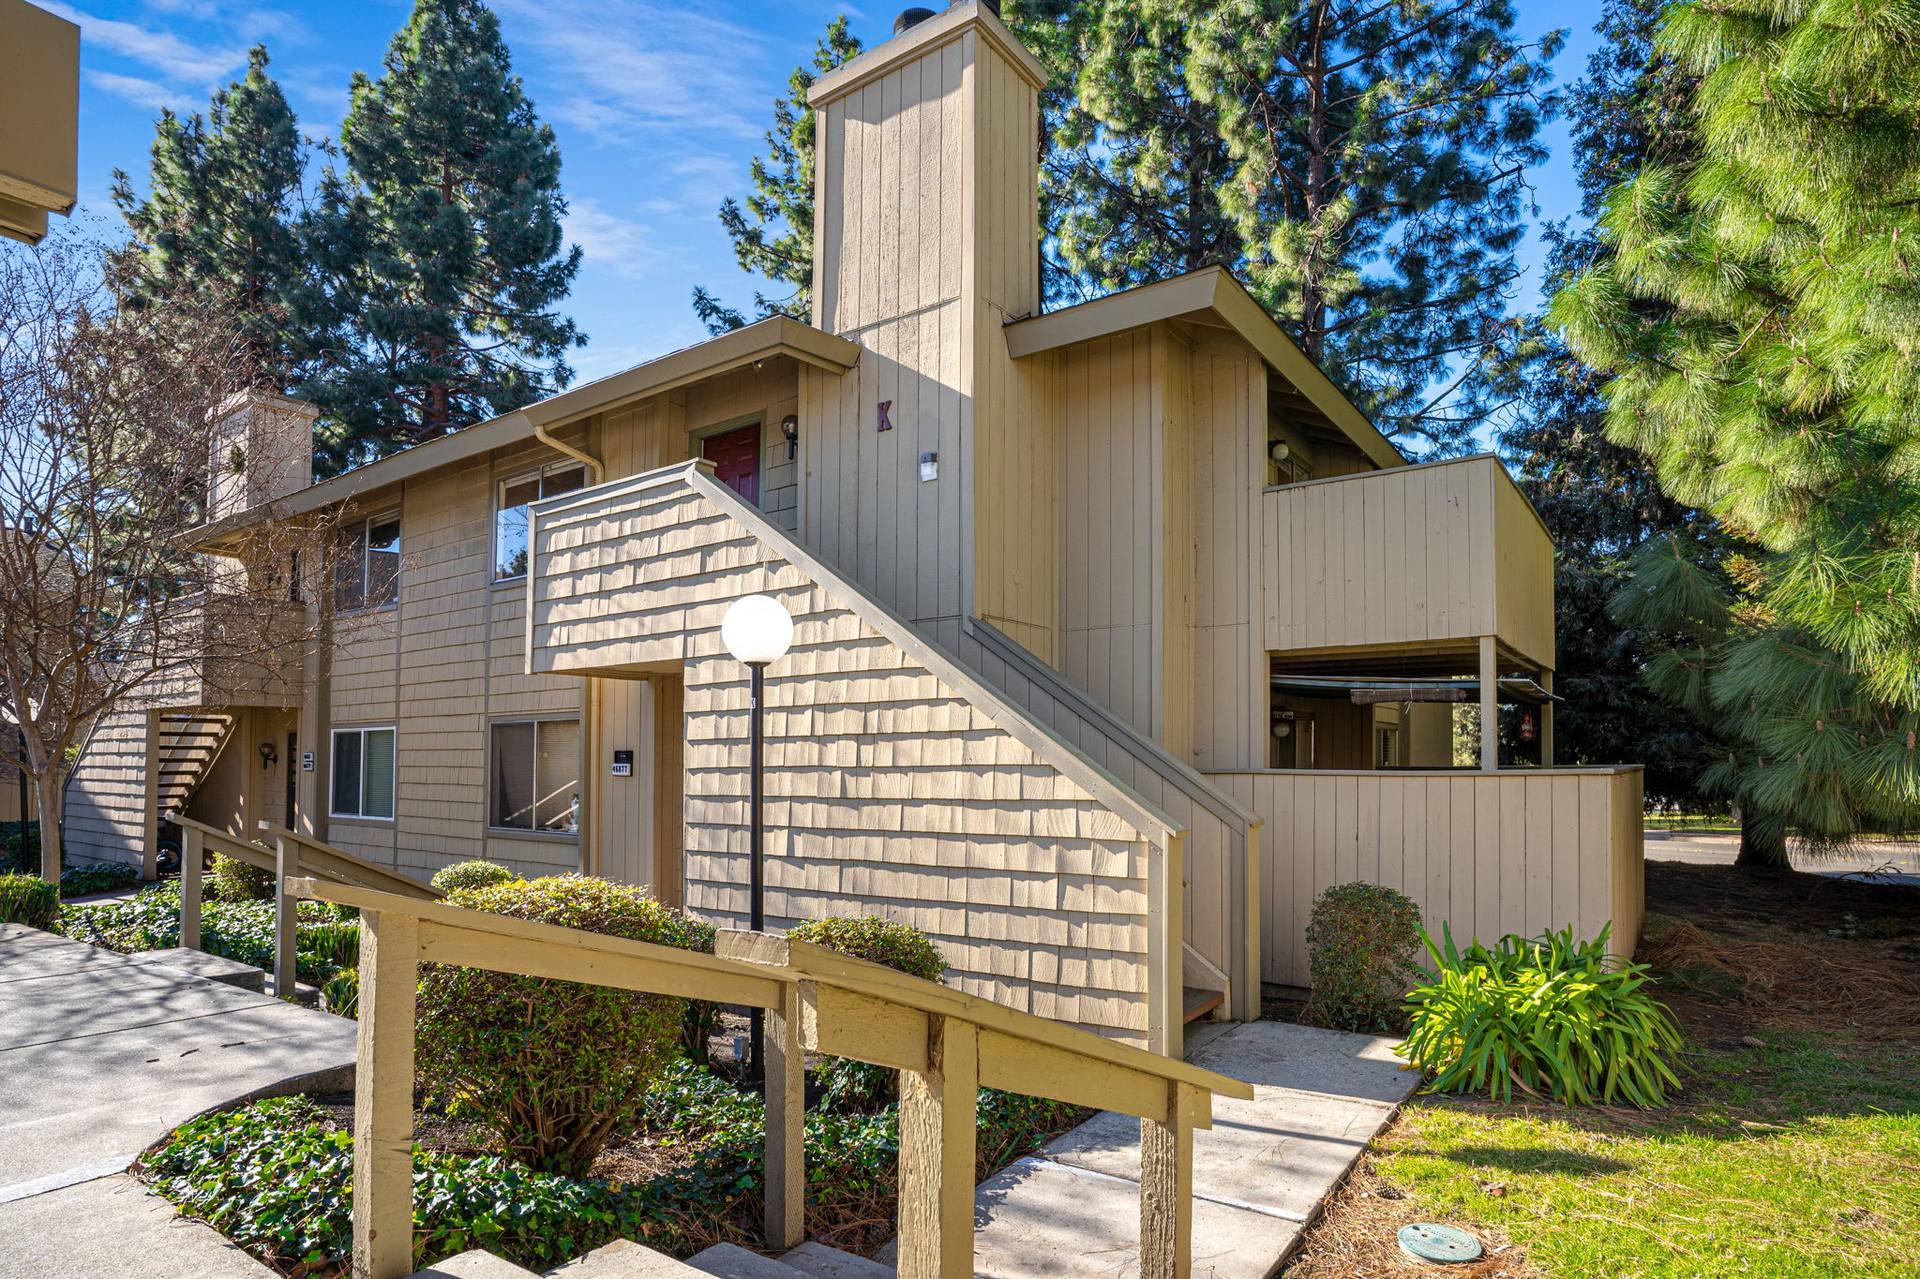 46875 Fernald Common, Fremont, CA 94539, US